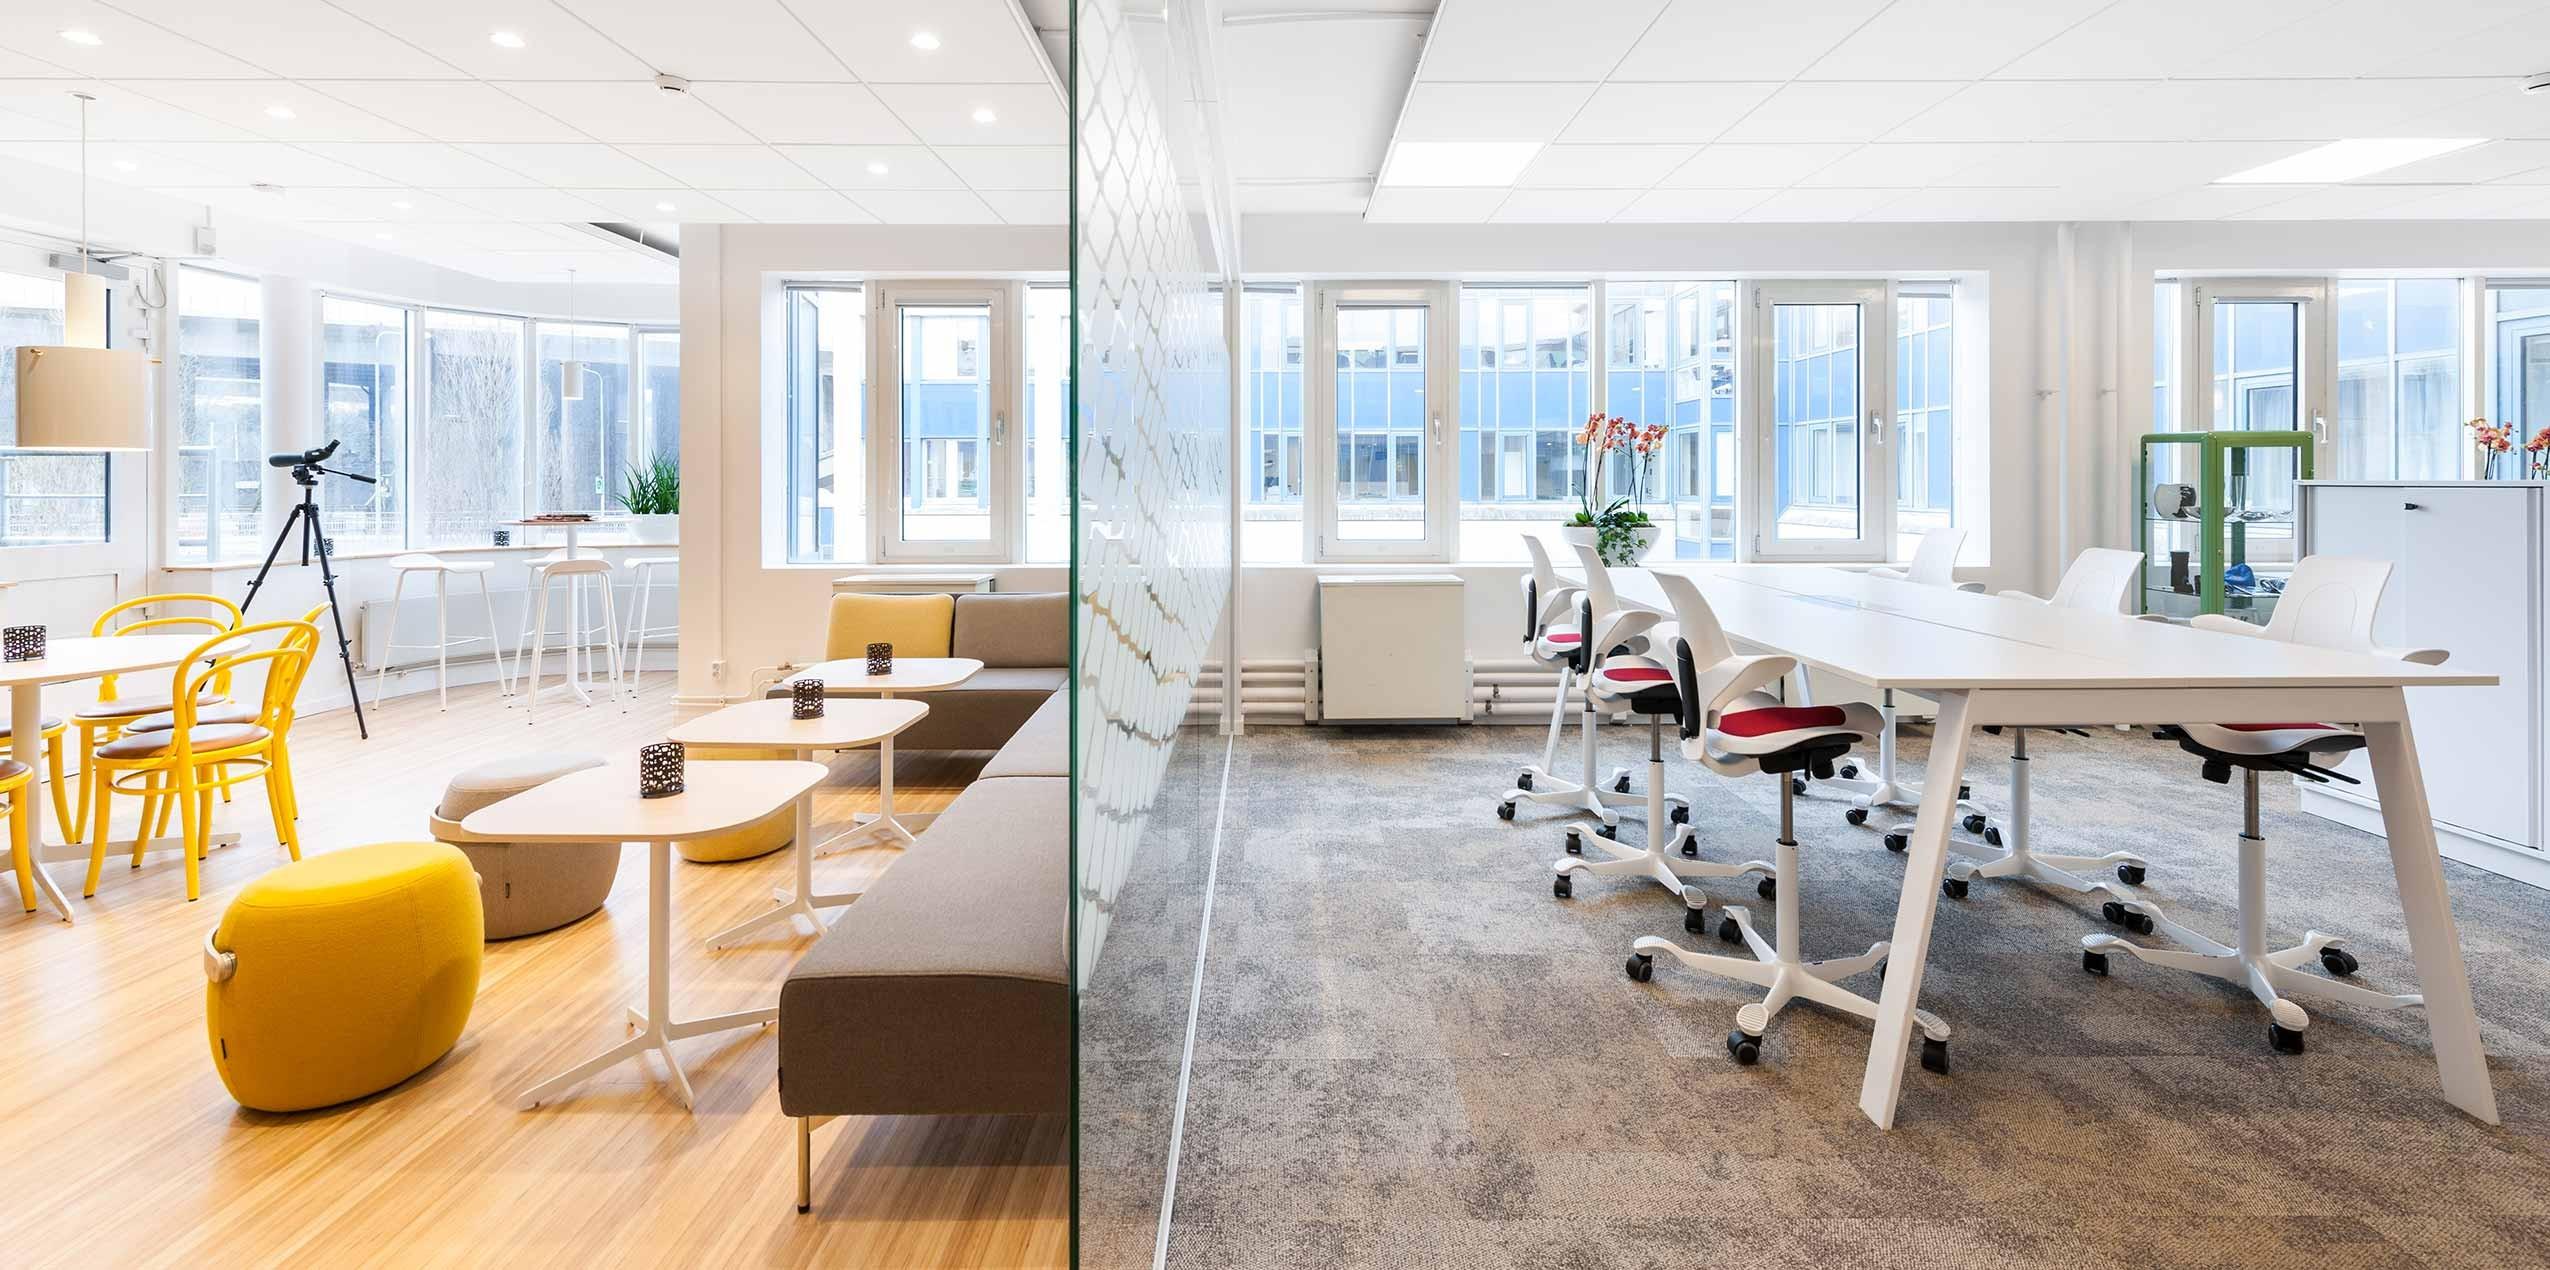 Liberlife丽联家具分享,疫情后如何营造舒适又高效的办公环境